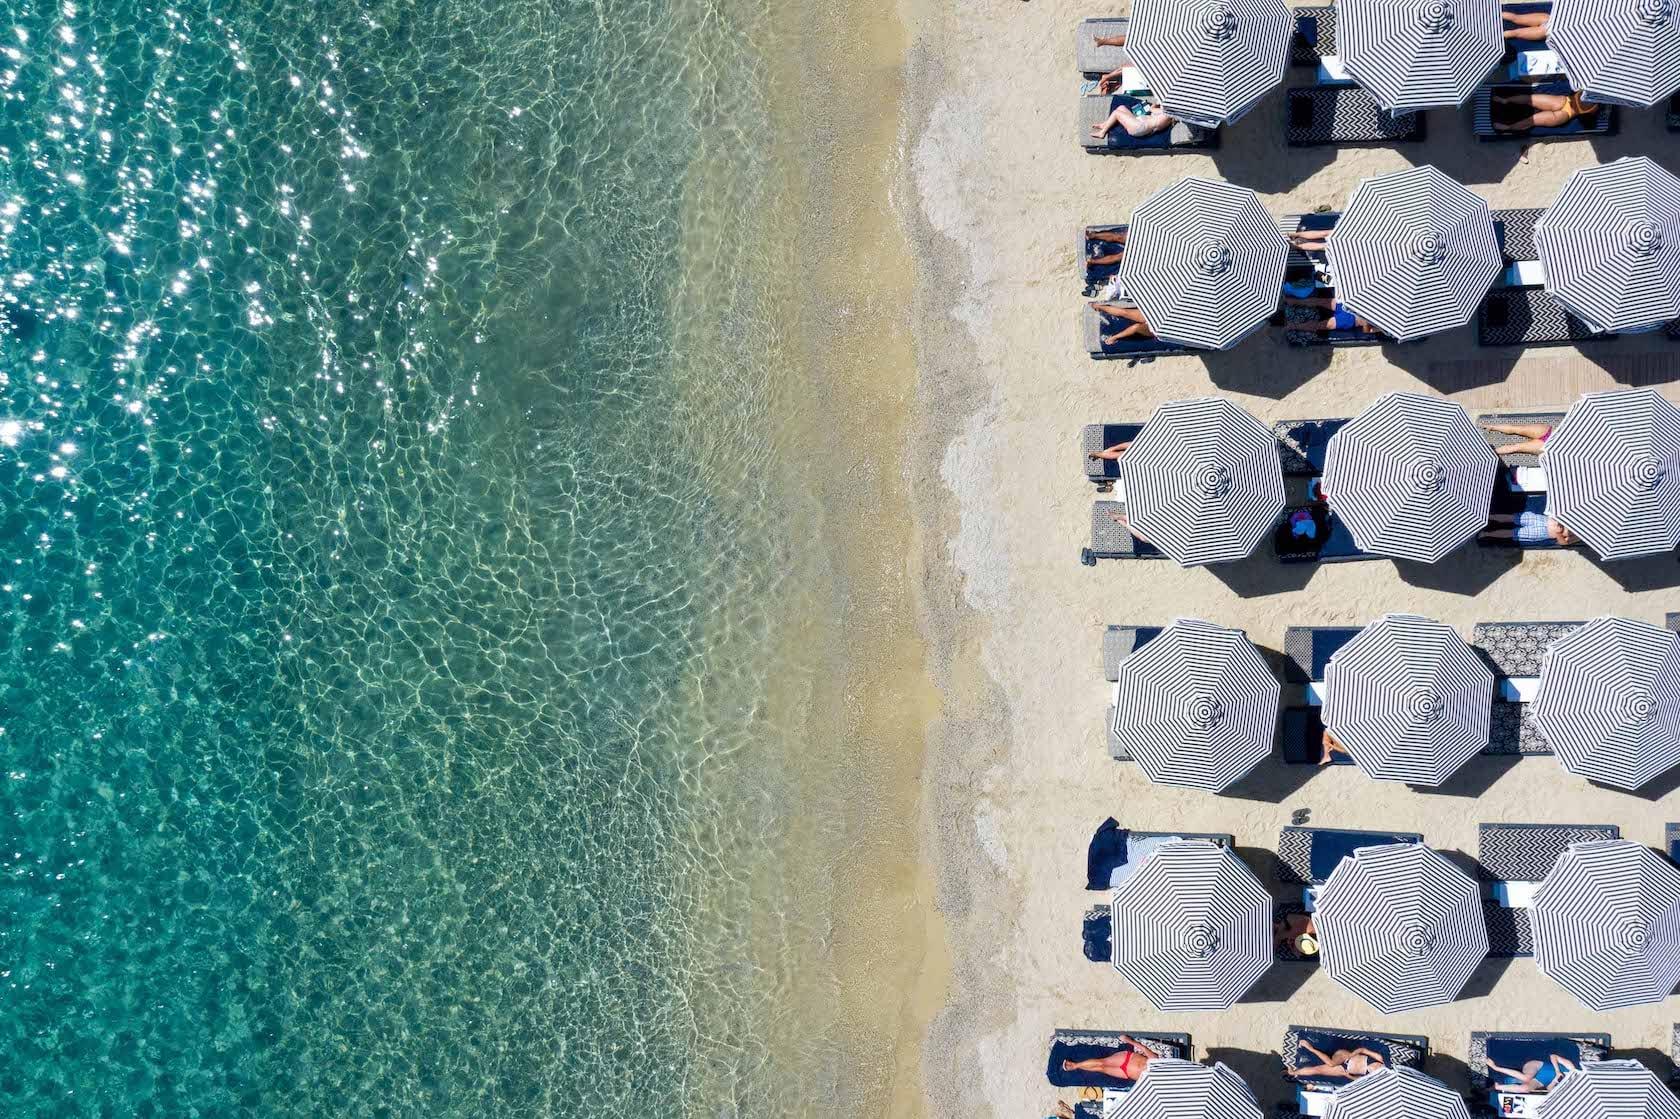 Overhead view of sun umbrellas and the beach of Ornos in Mykonos.